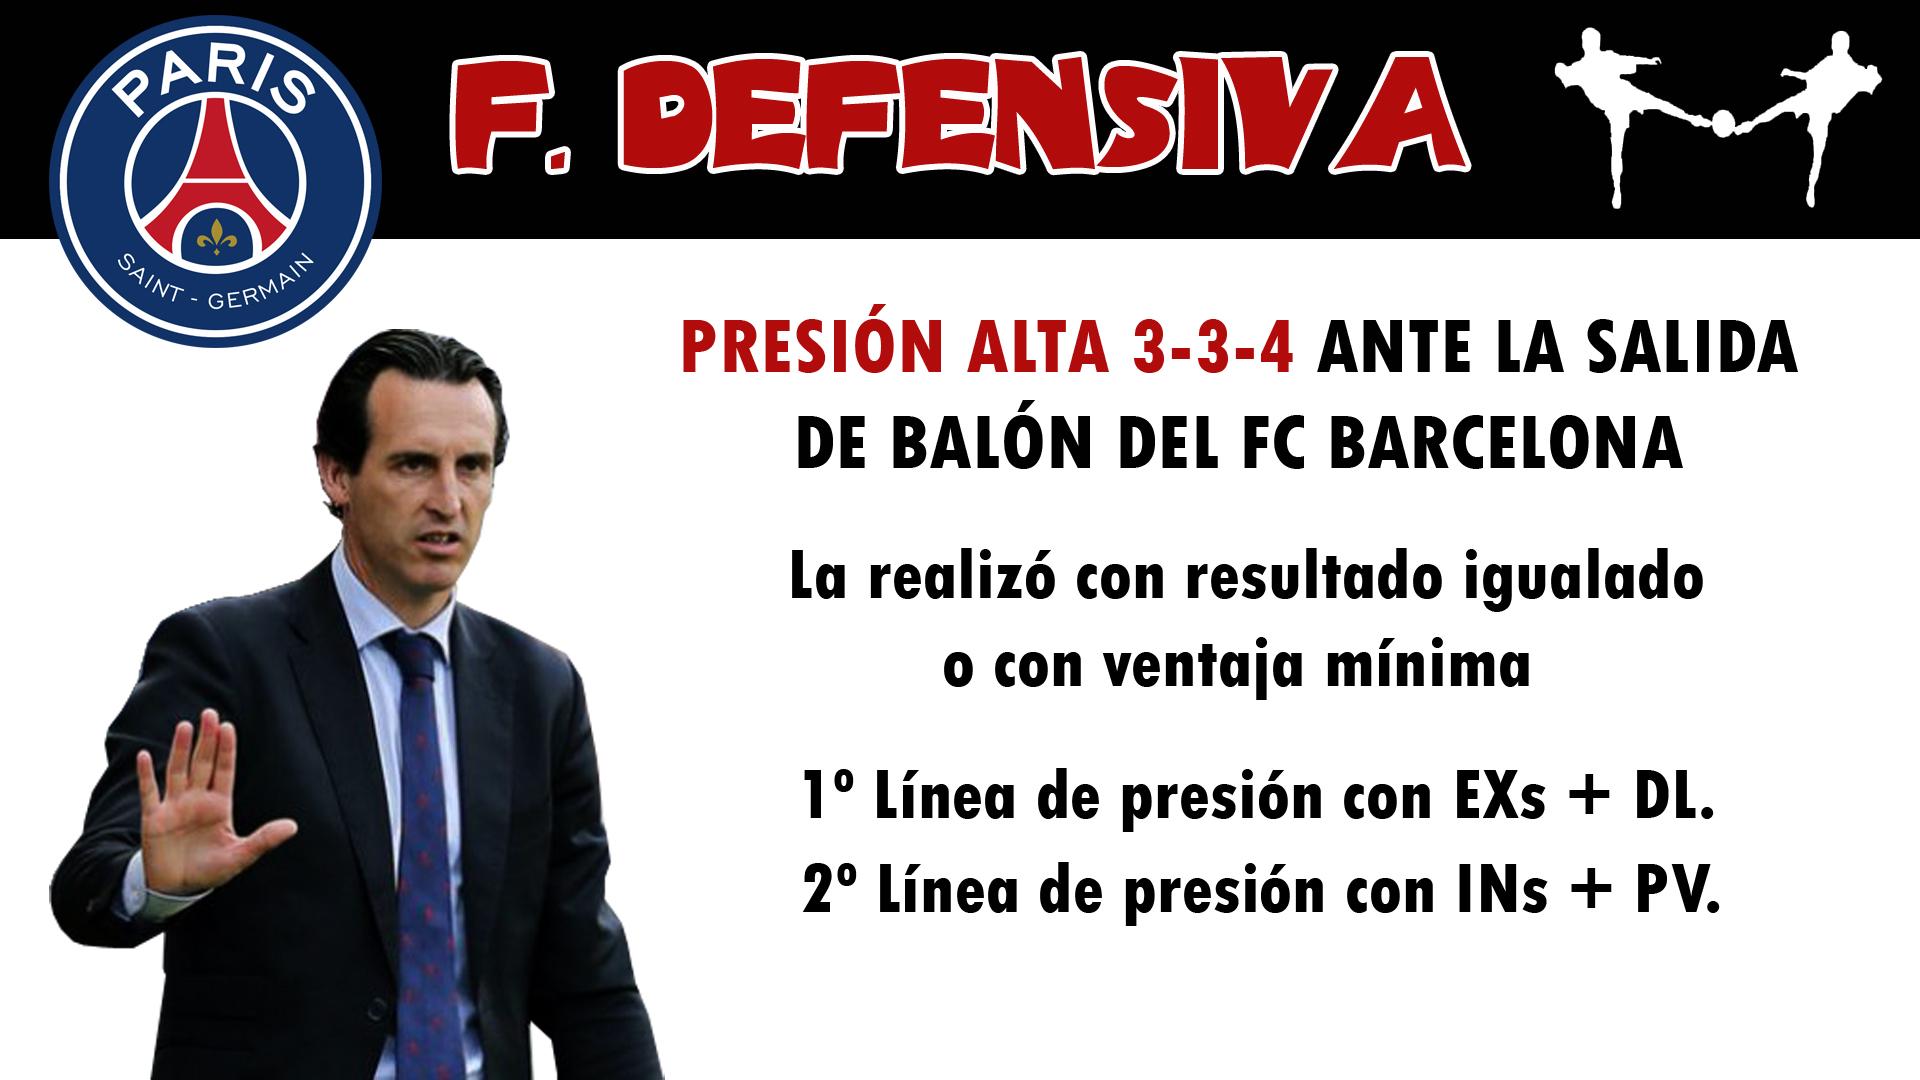 futbolcarrasco unai emery psg champions league fc barcelona luis enrique